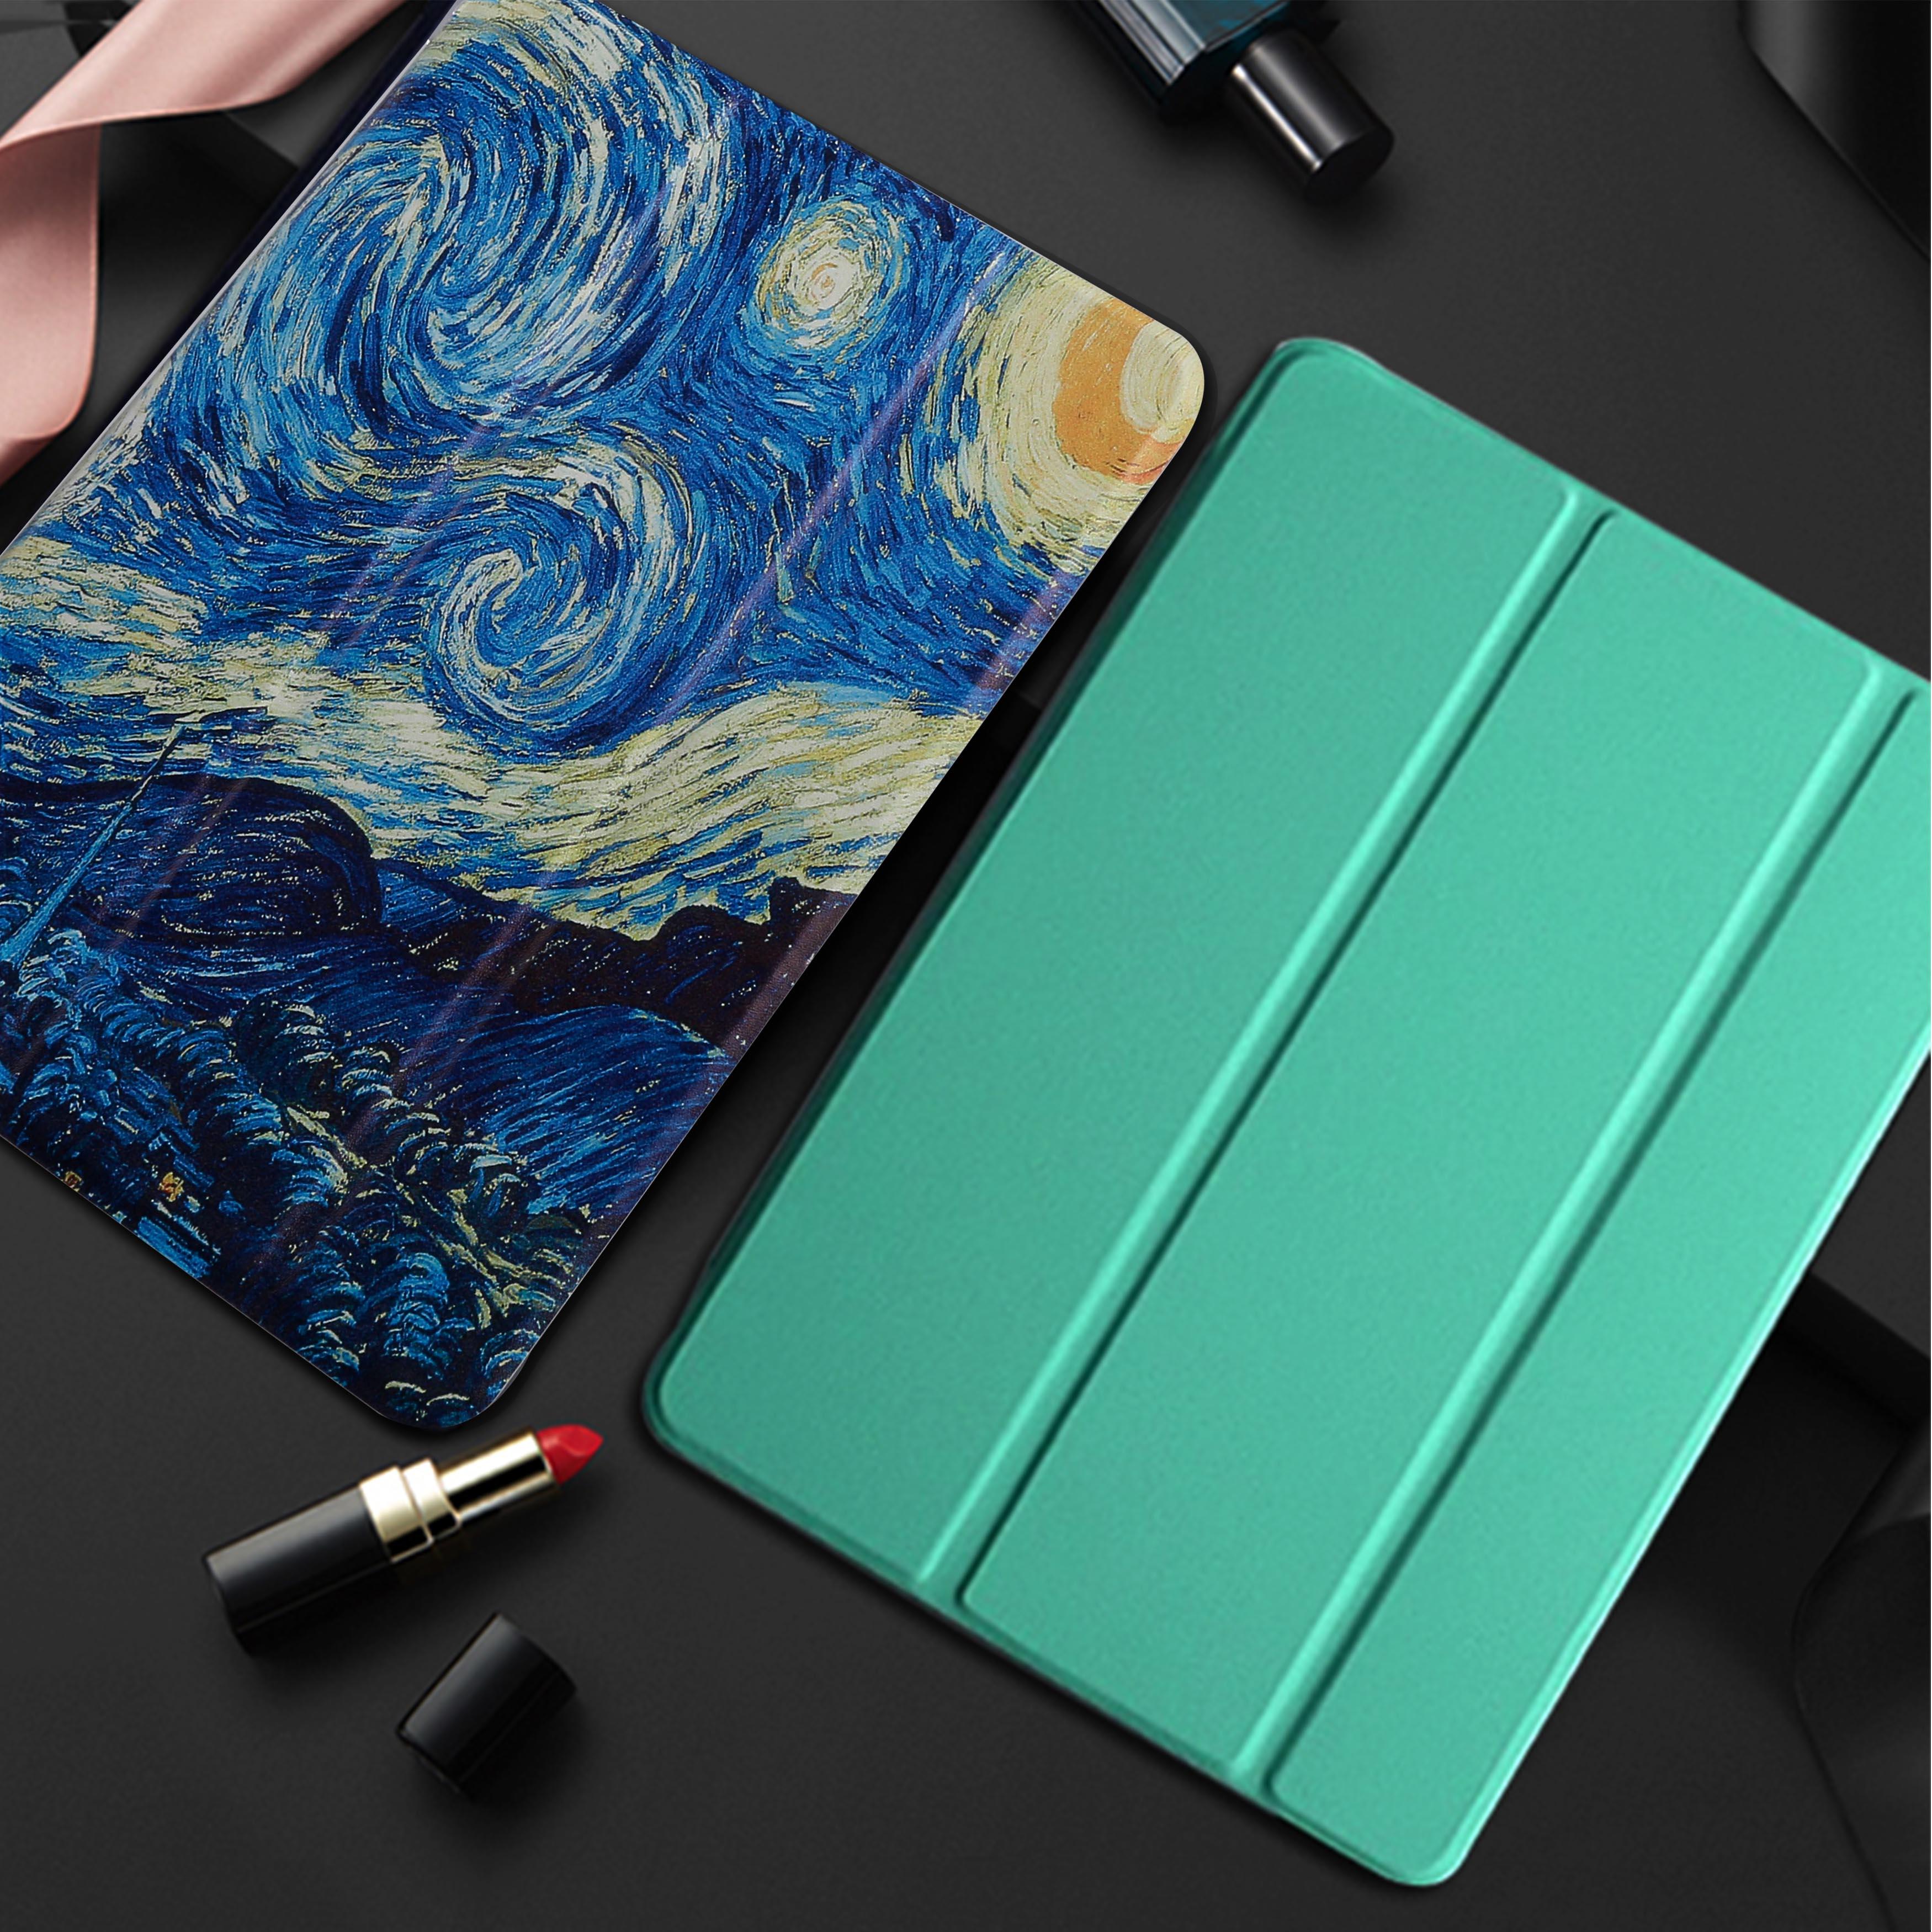 Pokrowiec na tableta do Samsung Galaxy Tab A 10.1 ''2016 sm-t580 T585 fundas ultra cienki wake smart cover do sm-t580 etui ochronne